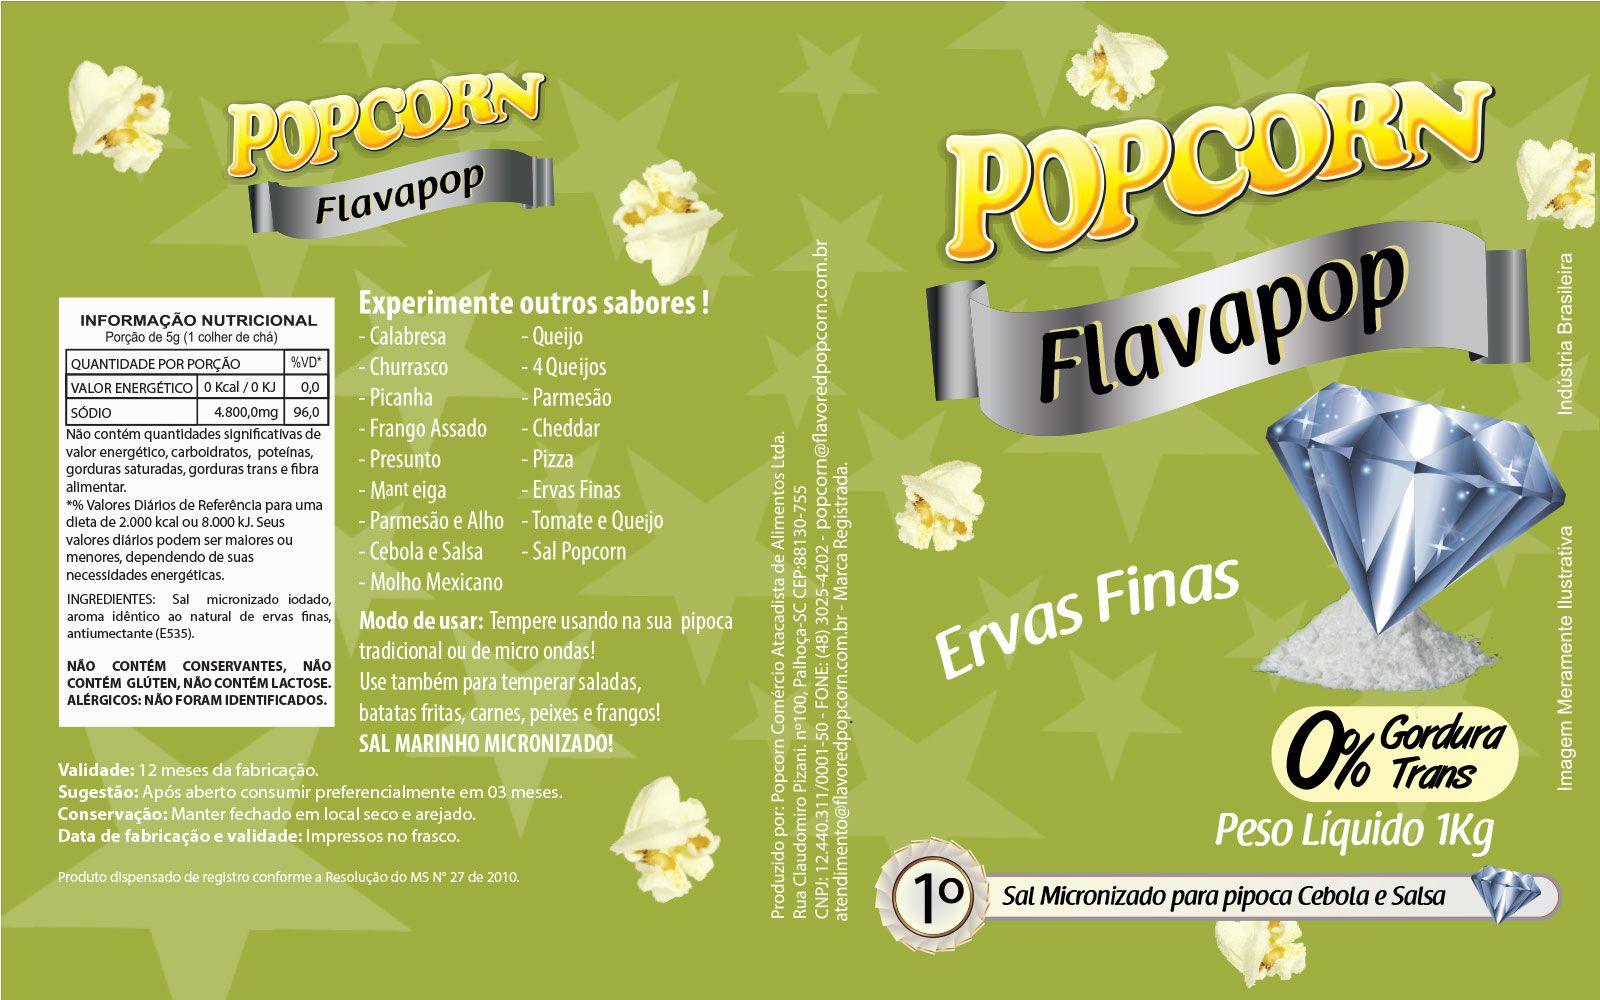 FLAVAPOP - Original de cinema -  Ervas Finas - Micronizado Popcorn  - Pct 1kg